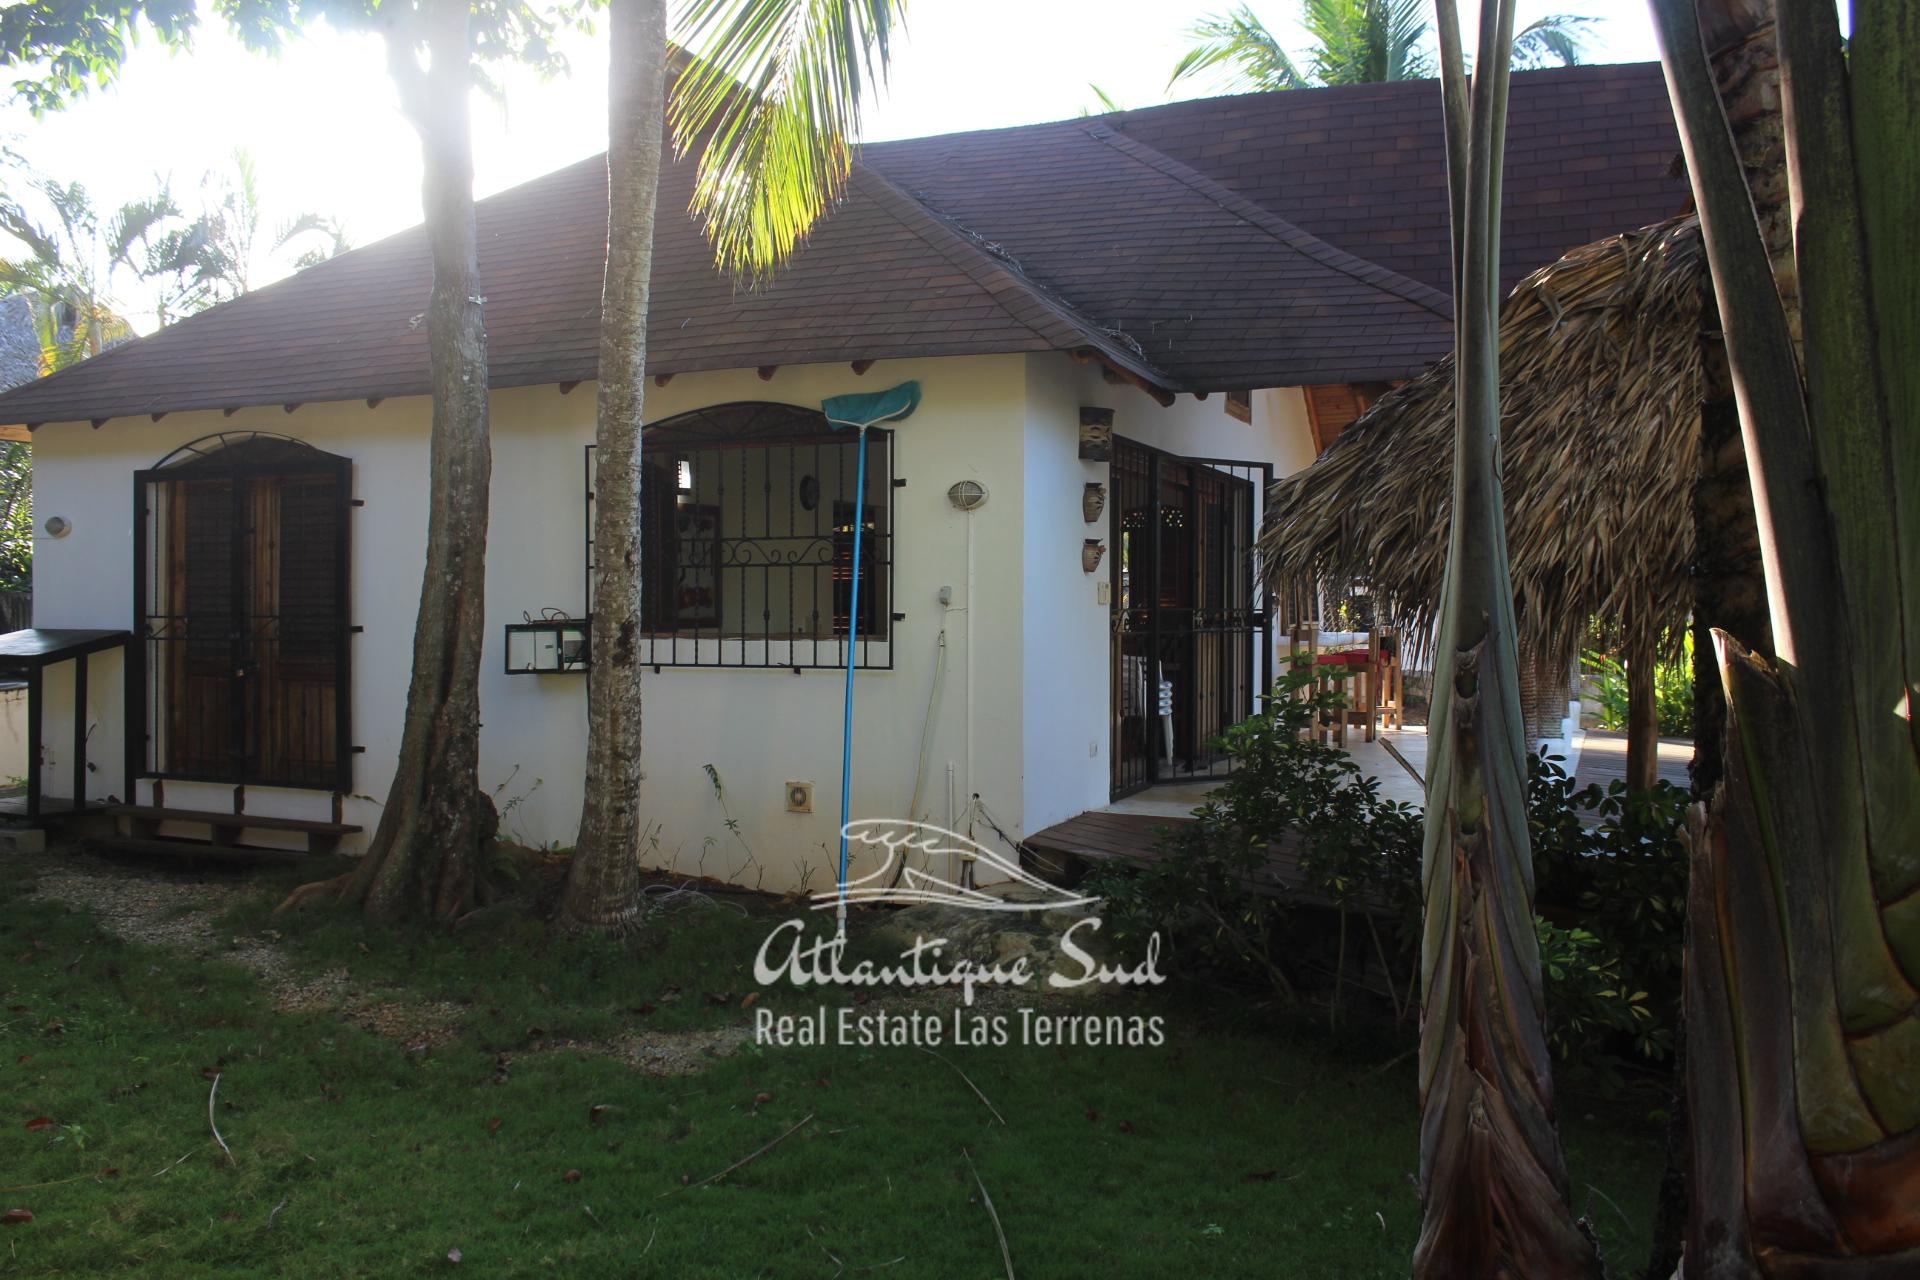 2 carribean villas minutes to the beach Real Estate Las Terrenas Dominican Republic Atlantique Sud21.jpg